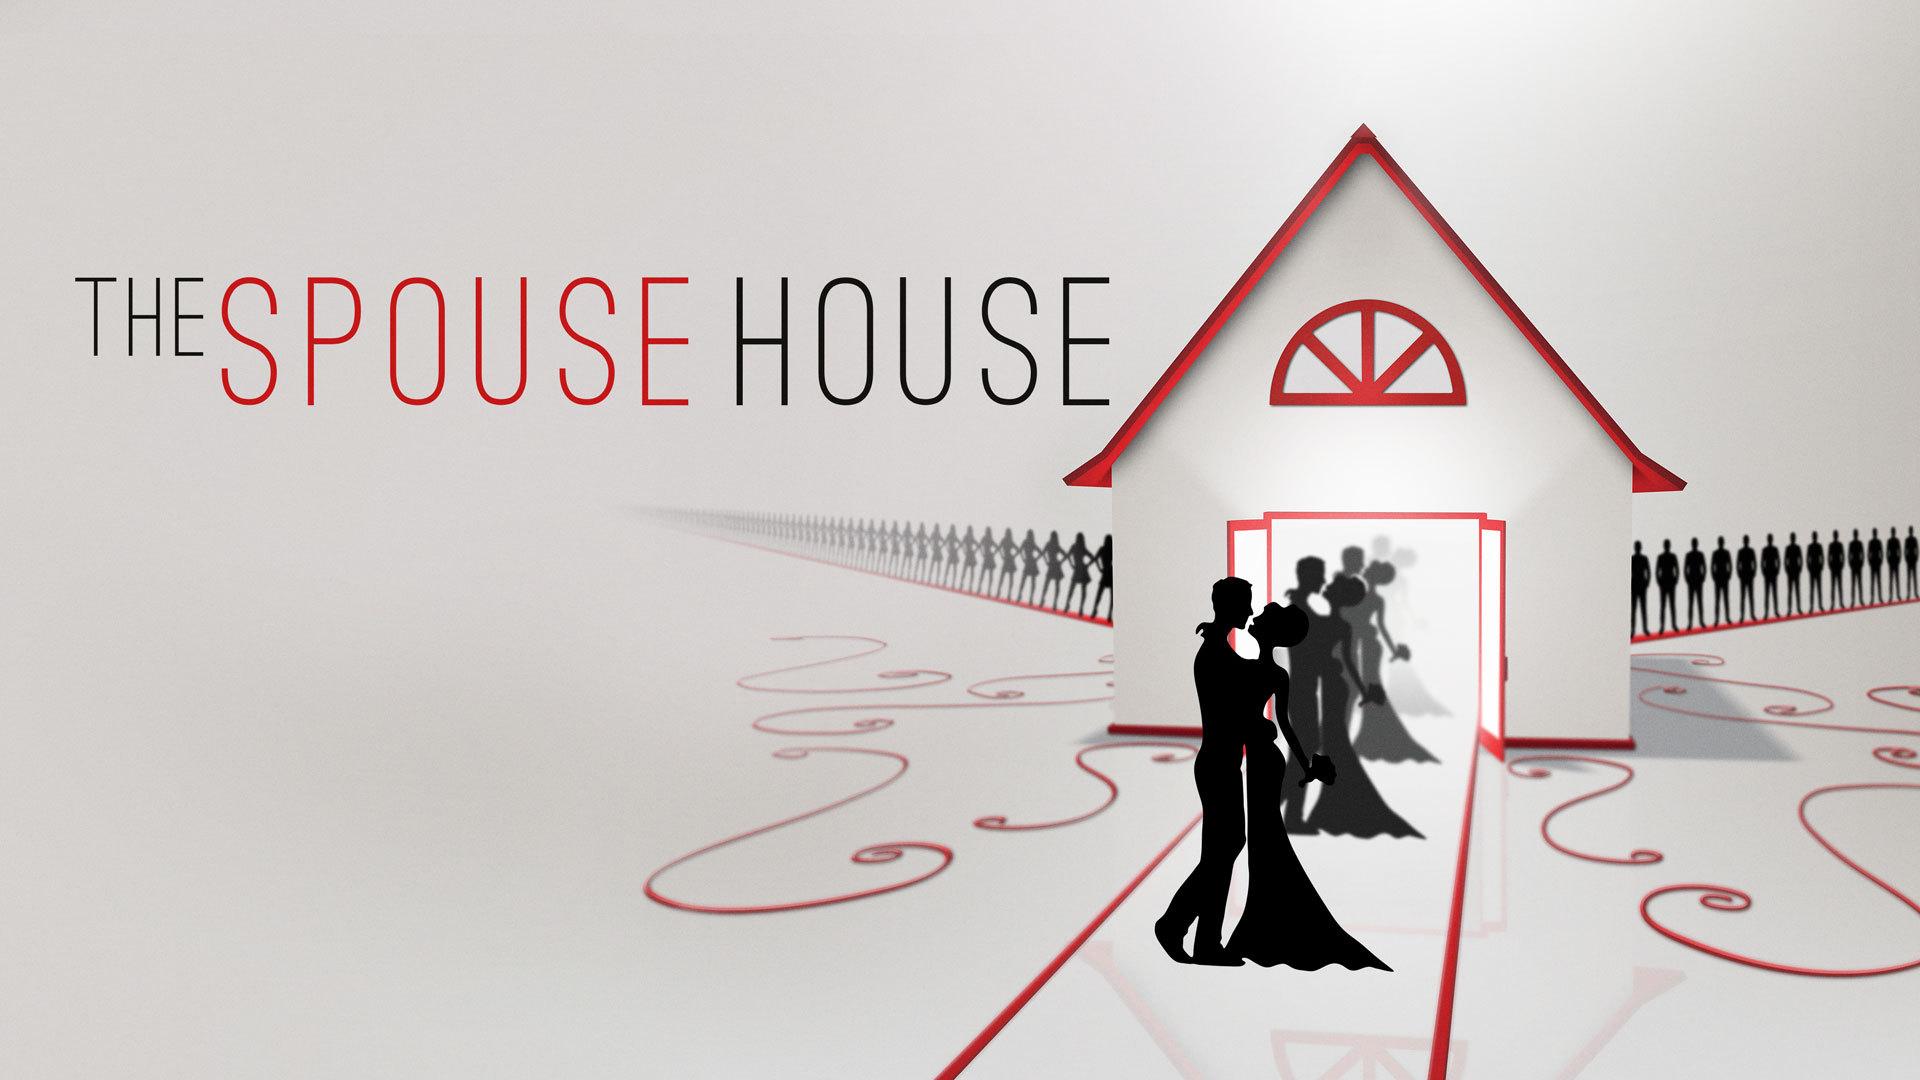 The Spouse House